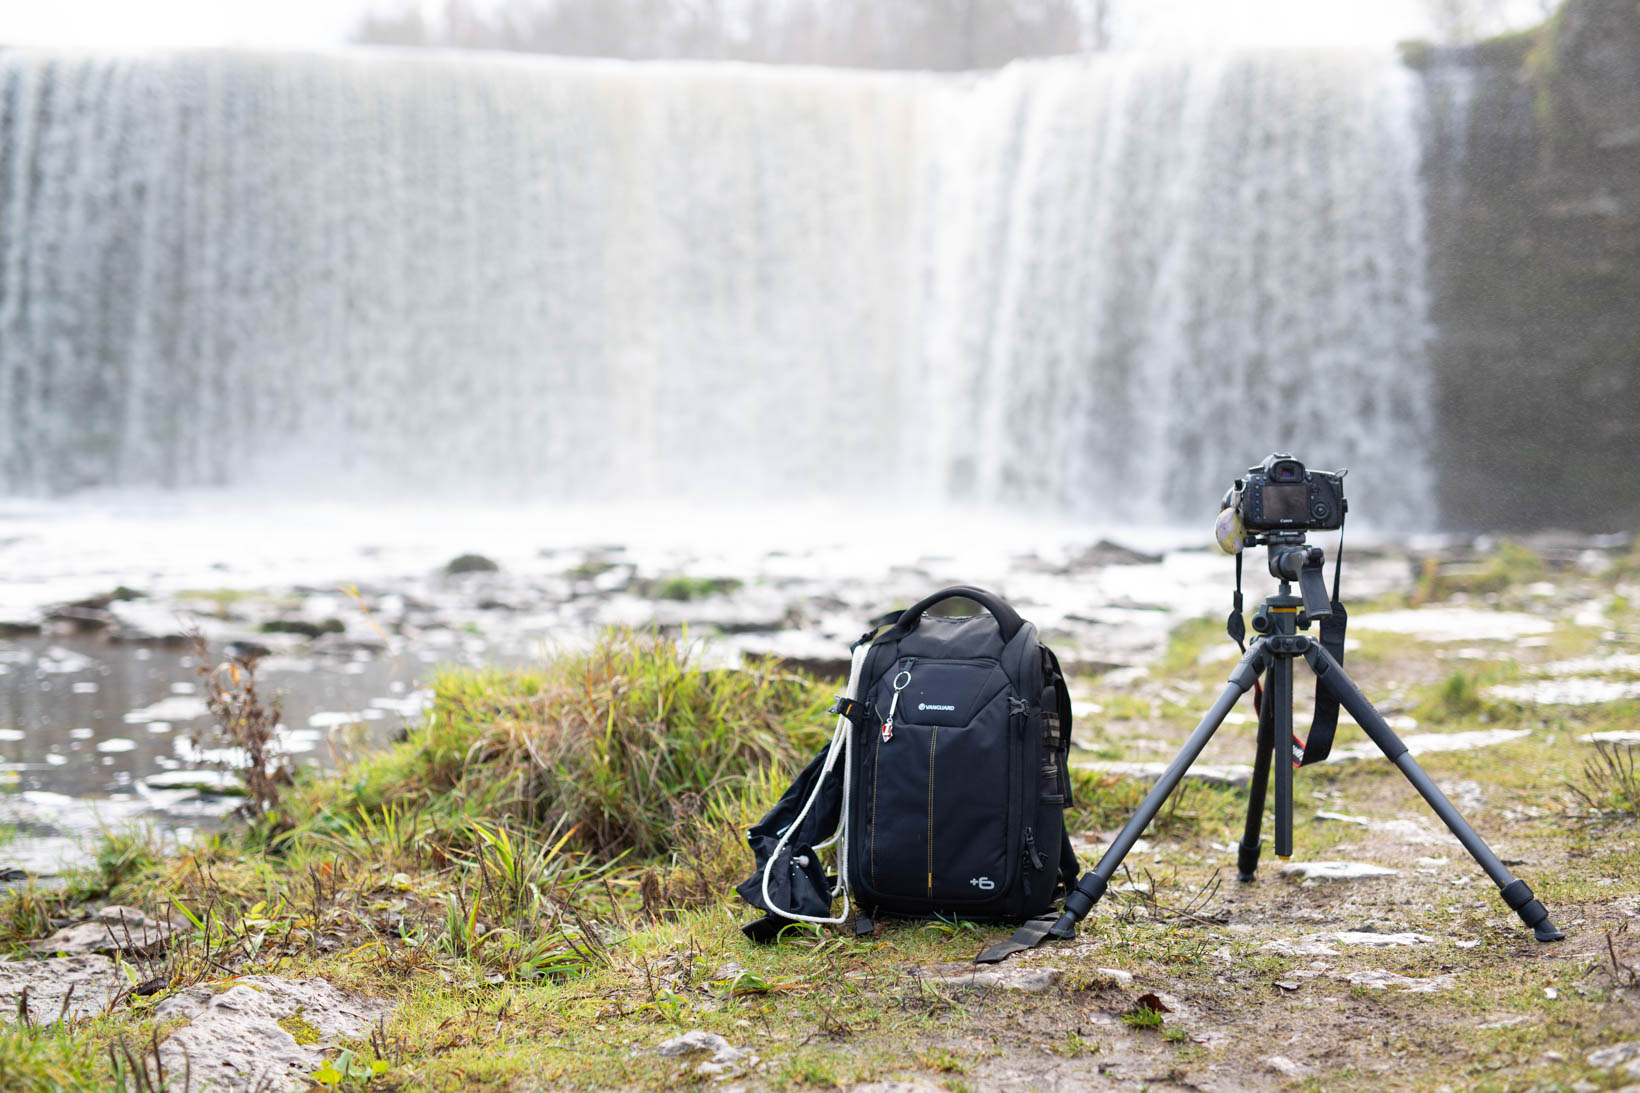 Vanguard_Stativ_Stativkopf_Erfahrungen_Test_Estland_Jäggala Juga Wasserfall (11)